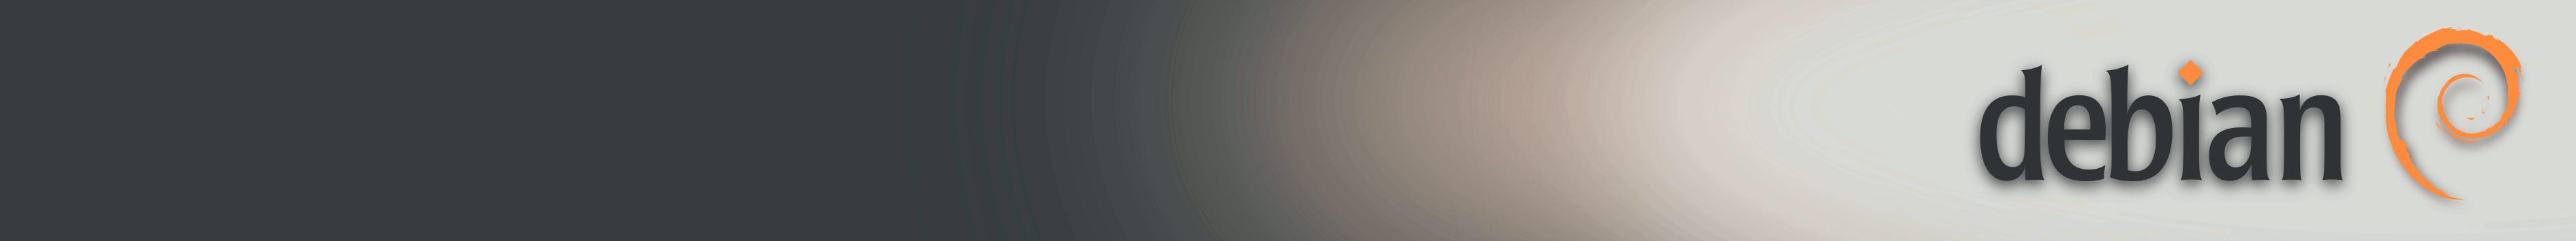 png/800x75-banner-installer-1-16bit.png